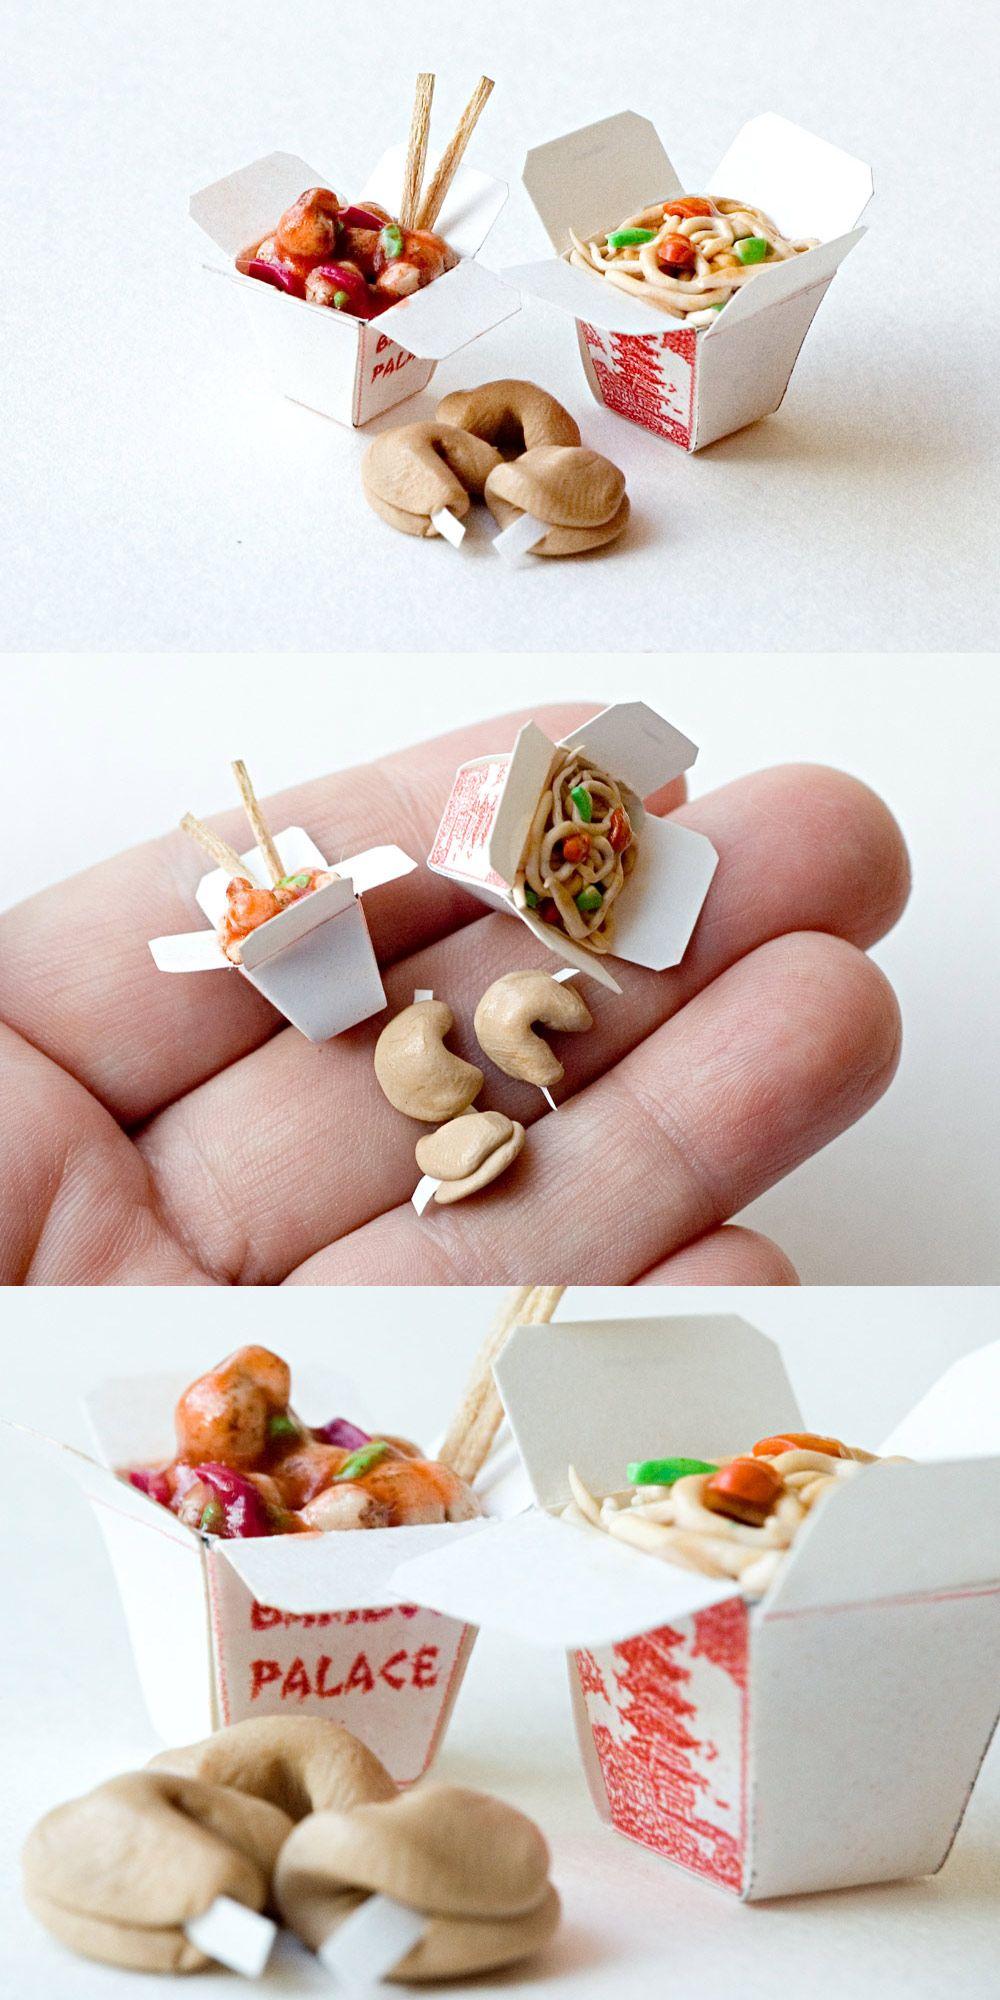 Barbie 1:6 Kitchen Food Miniature Handmade Box of Breakfast Sausage Links